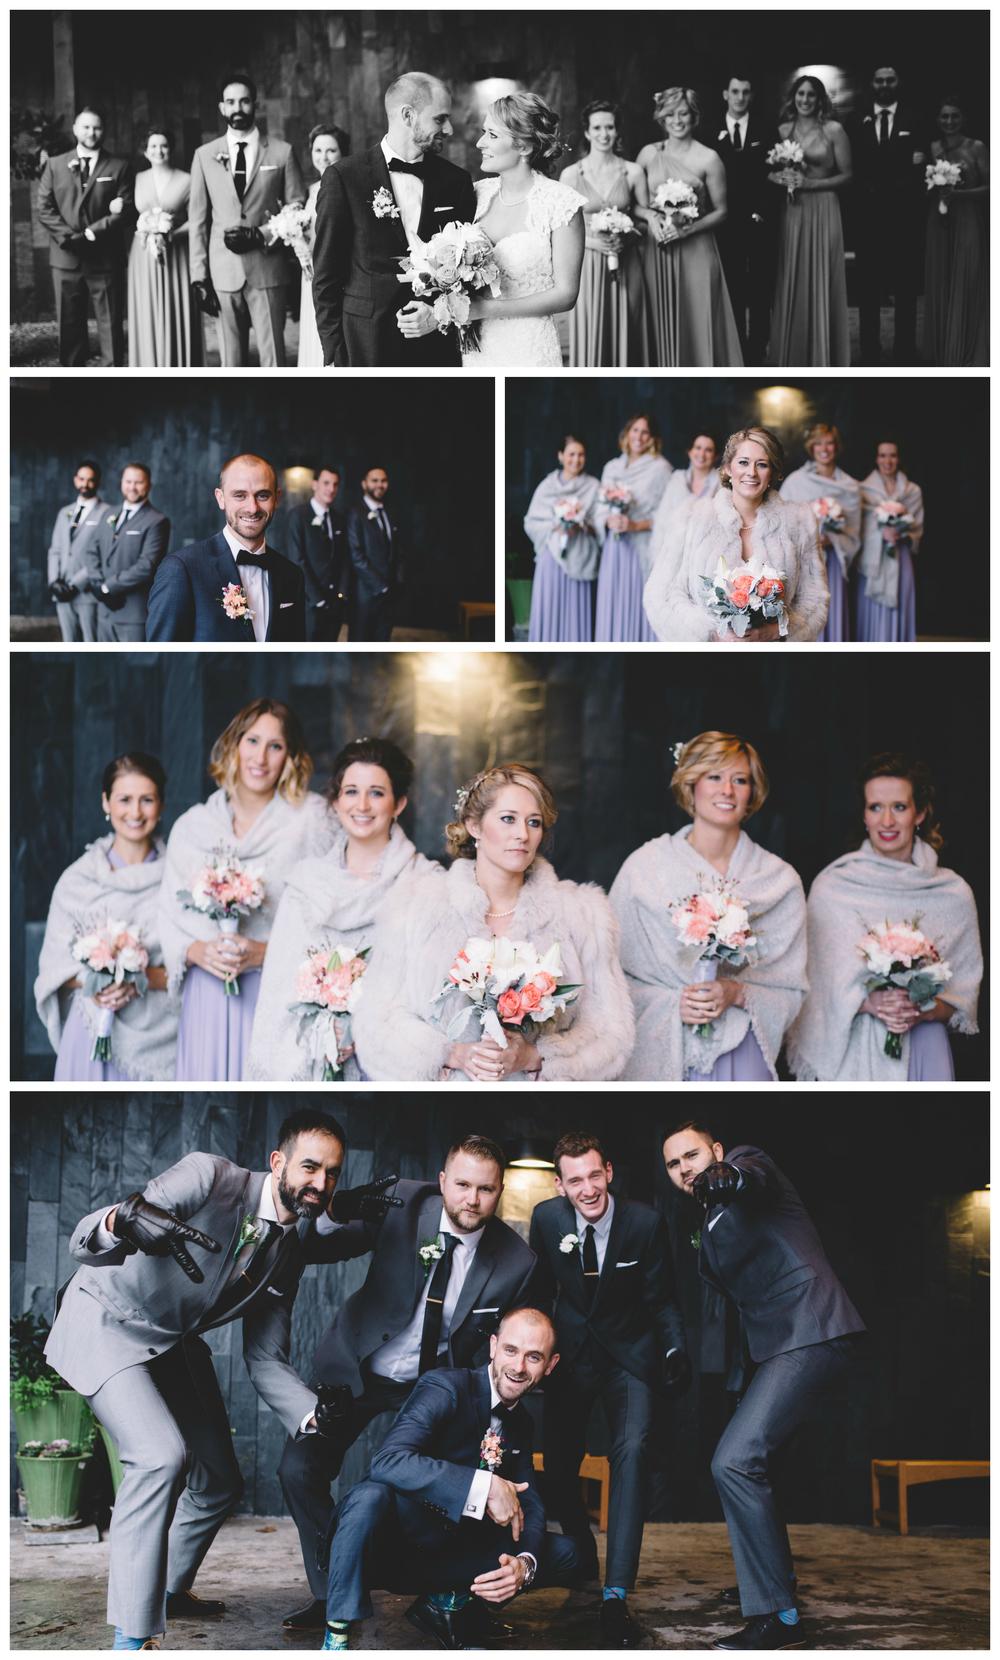 frick-wedding-8.jpg